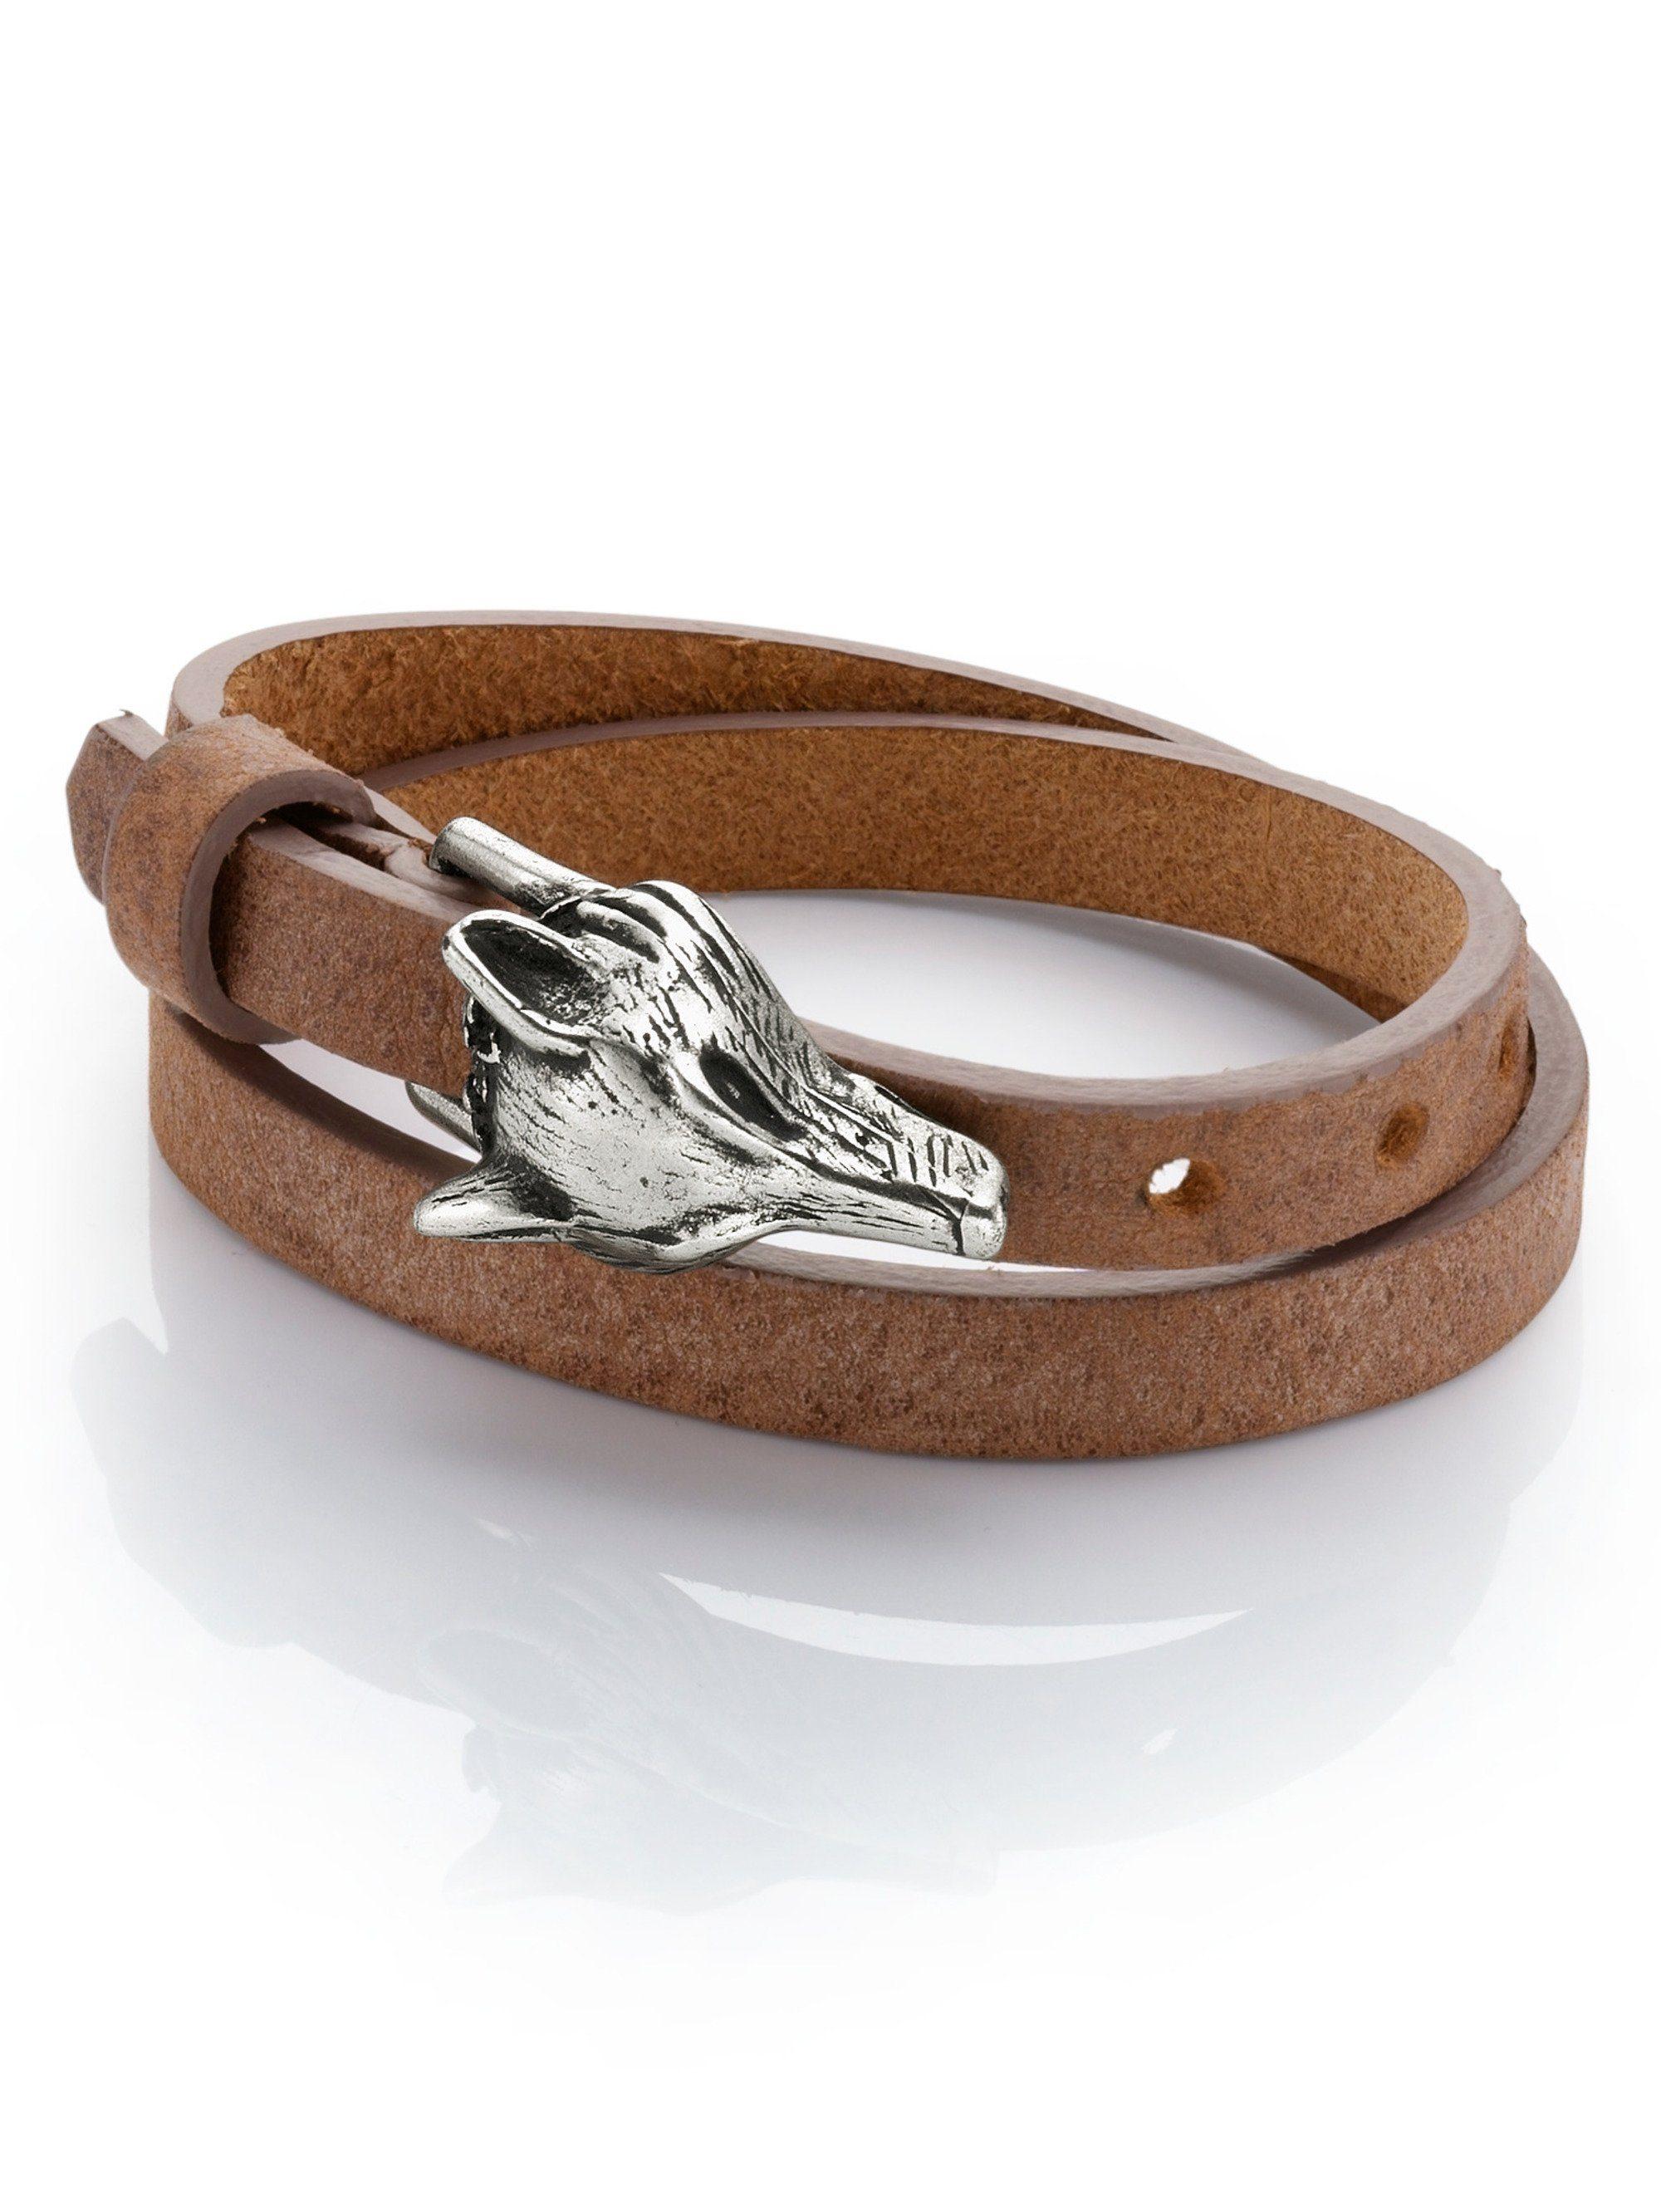 Alba Moda Armband mit Fuchskopf-Verschluss